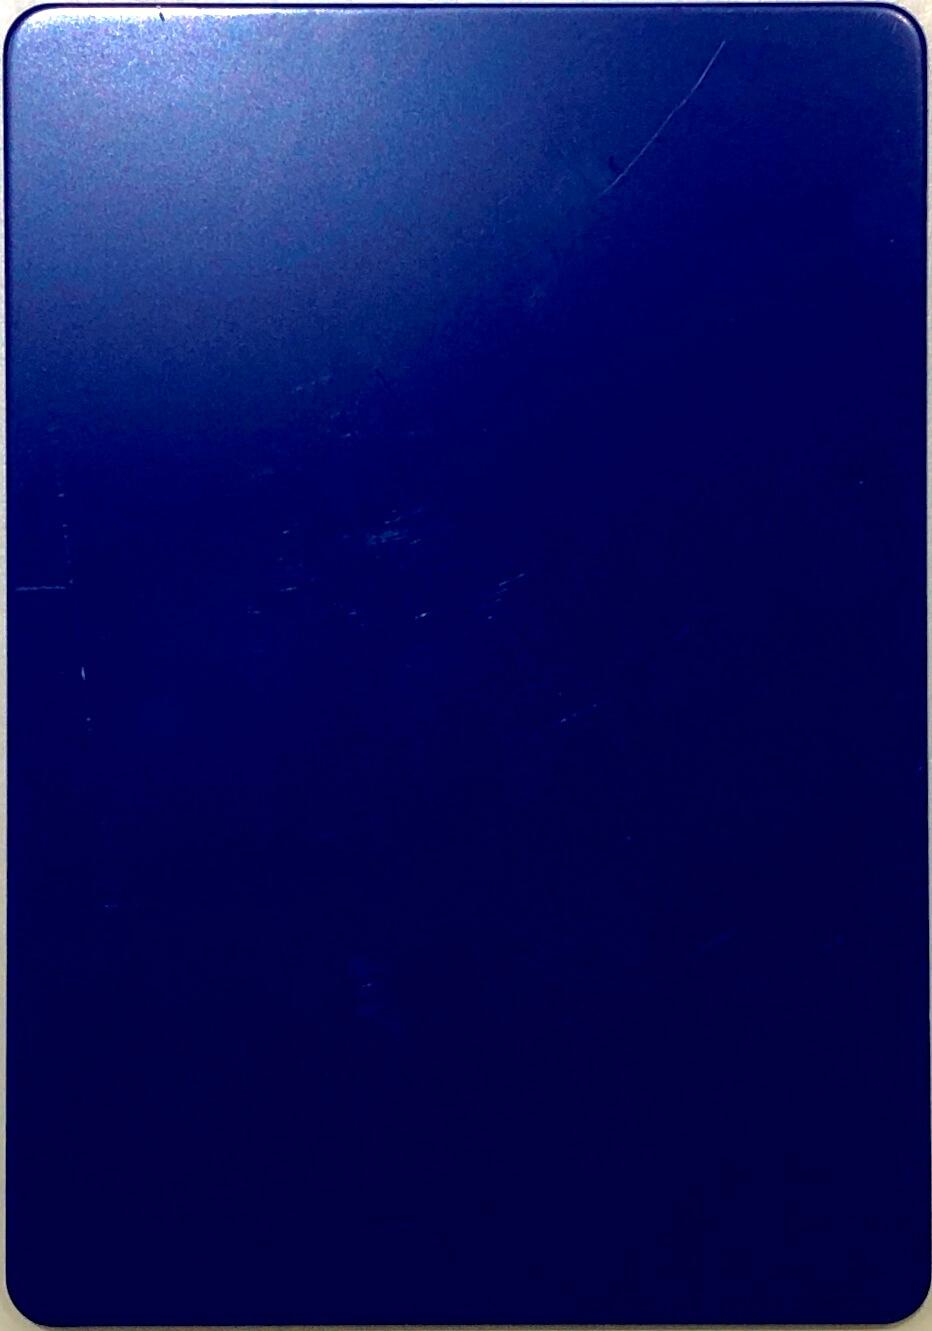 DARK BLUE Image